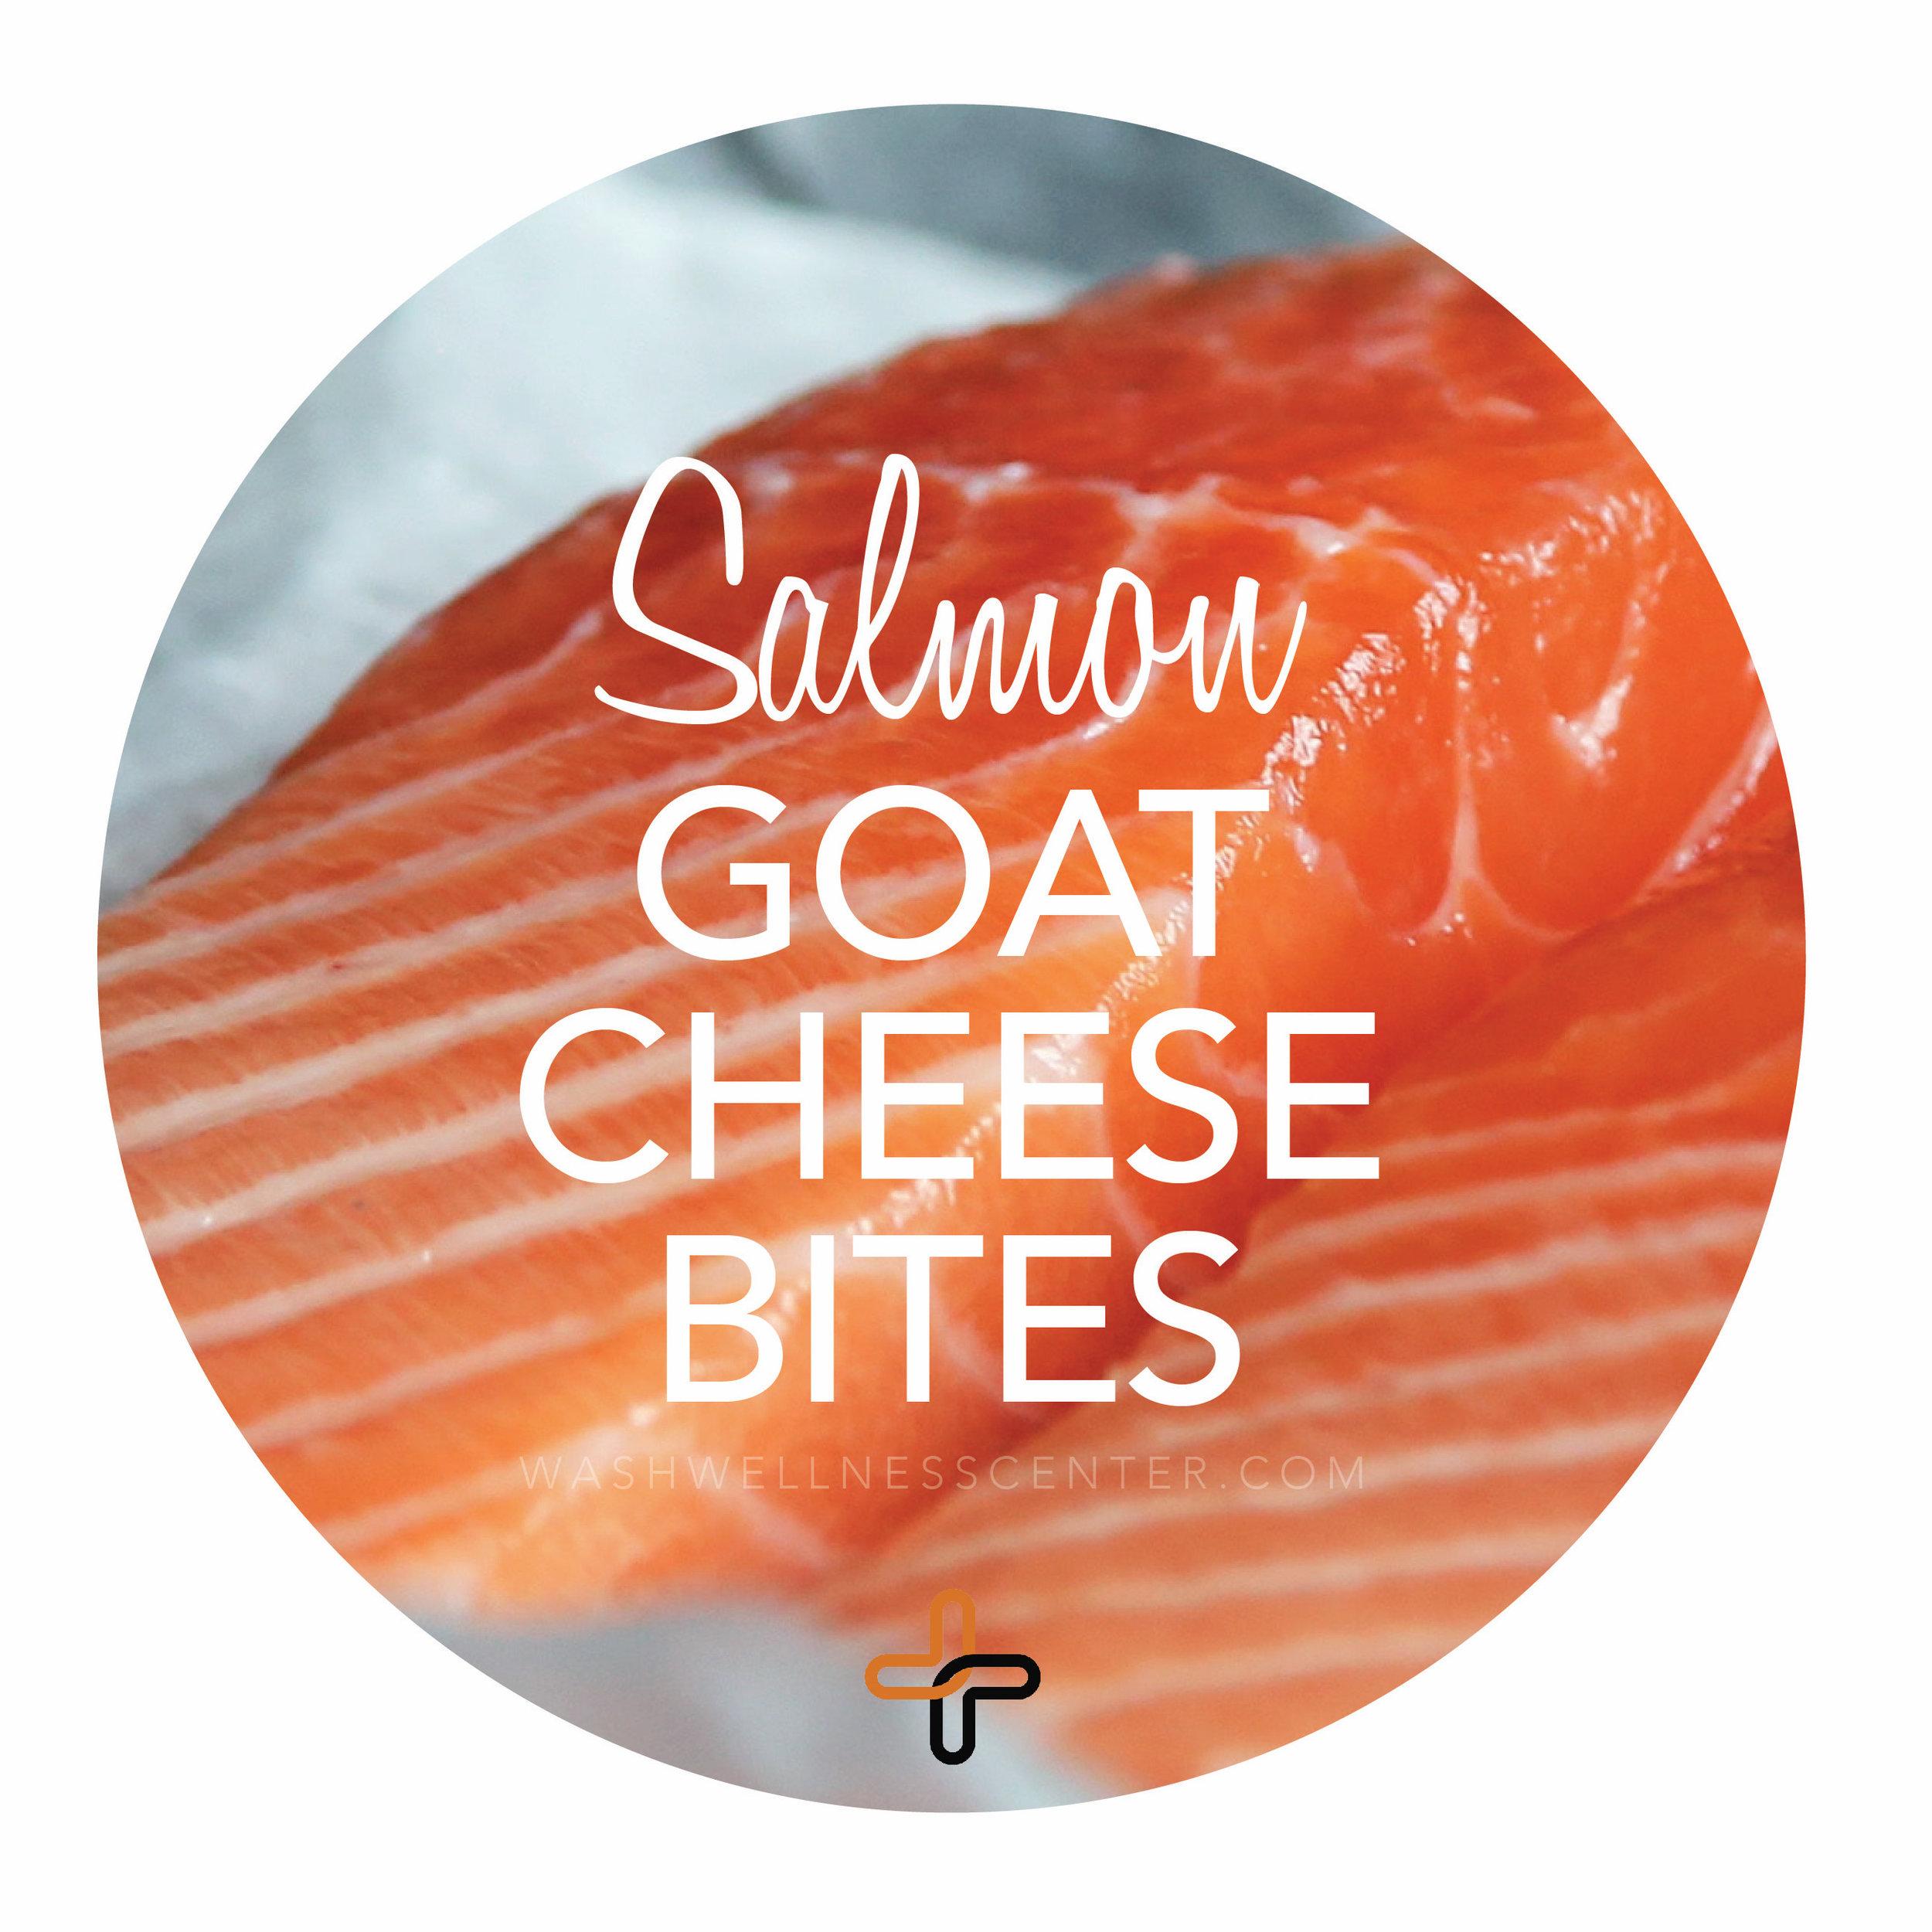 Salmon+Goat+Cheese+Bites.jpg